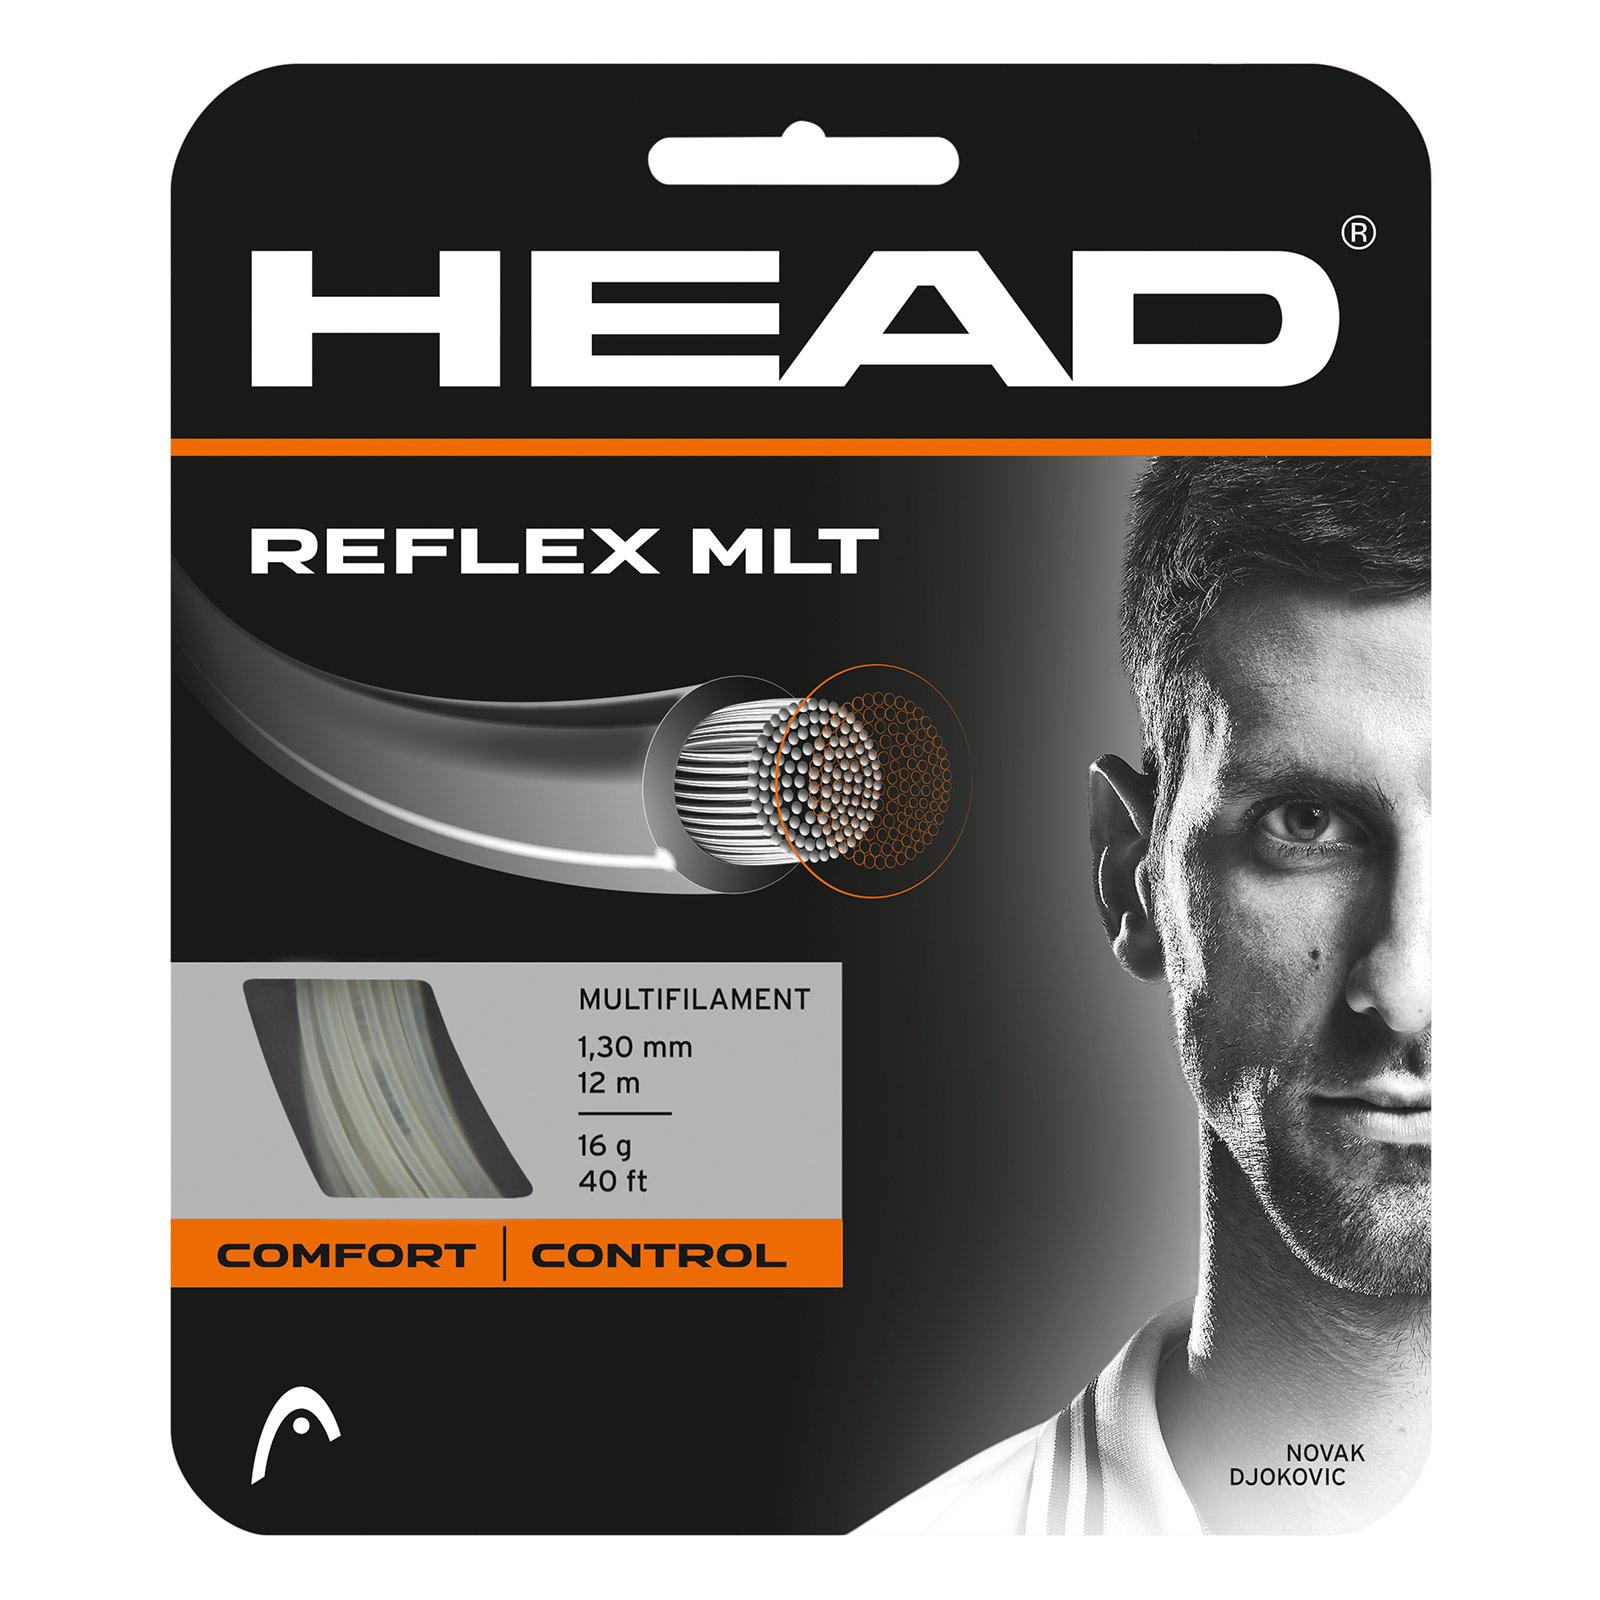 HEAD Reflex MLT 12m 1,30 Natural